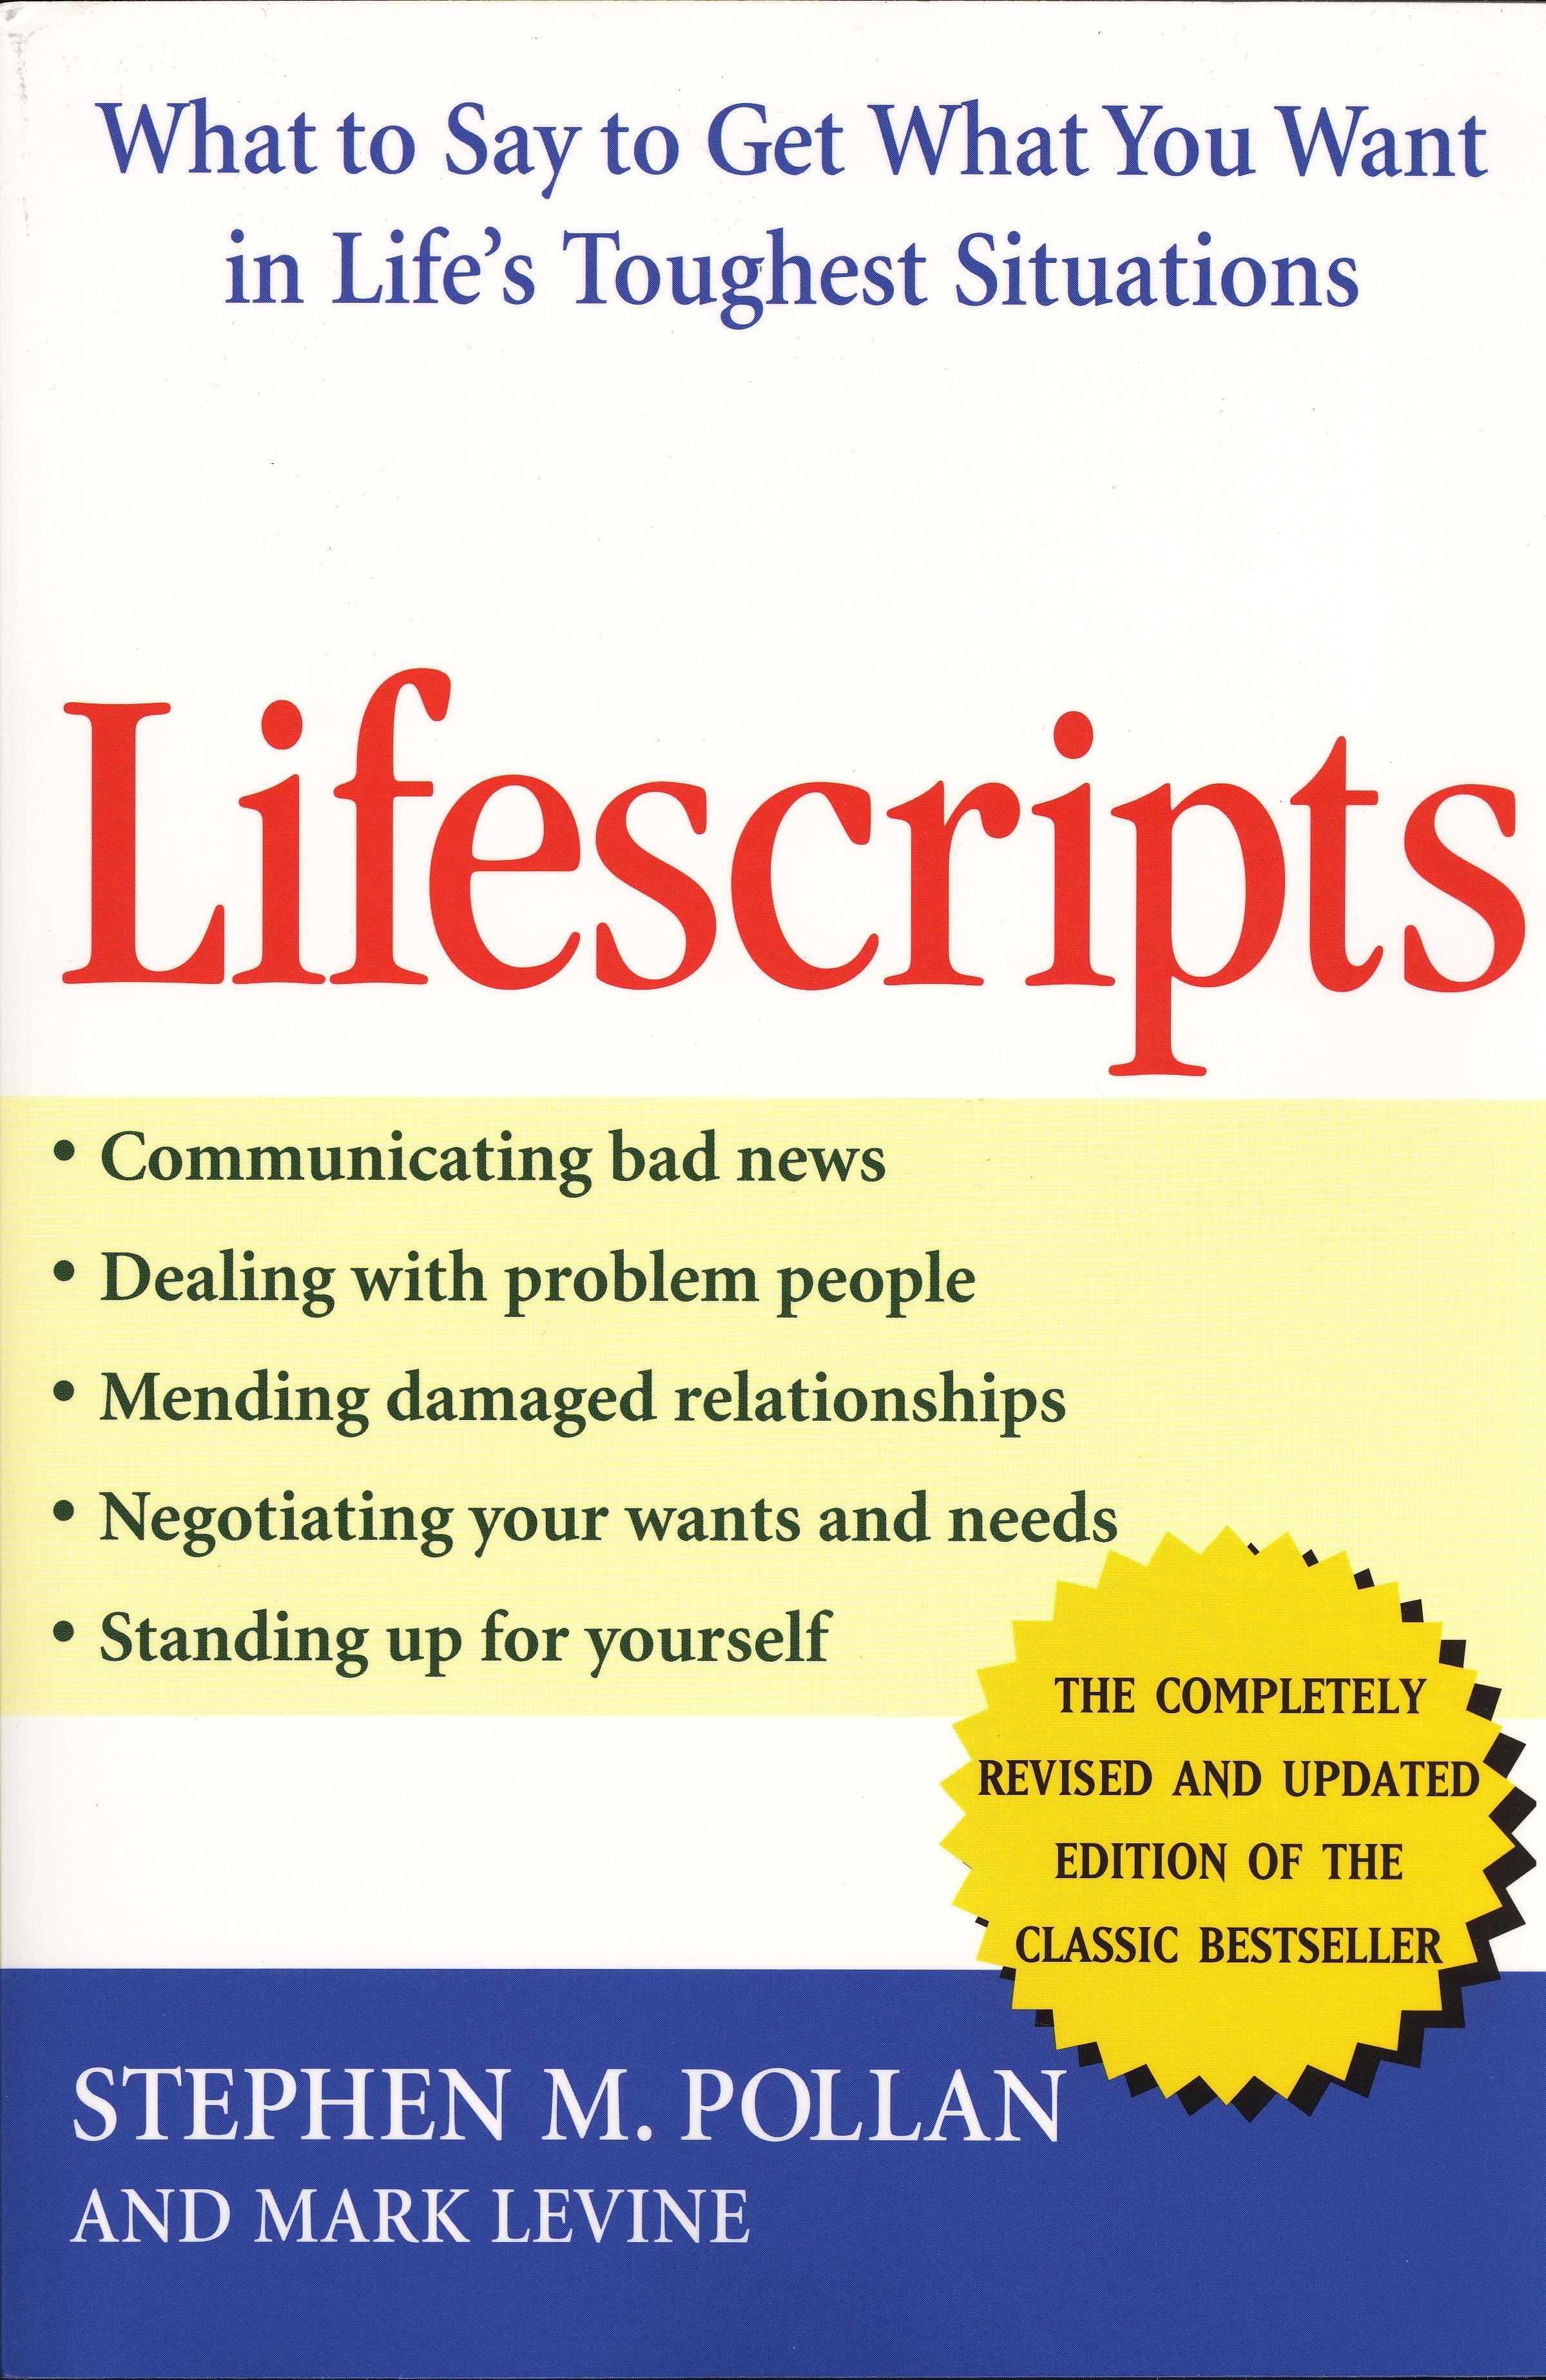 Lifescripts.jpg